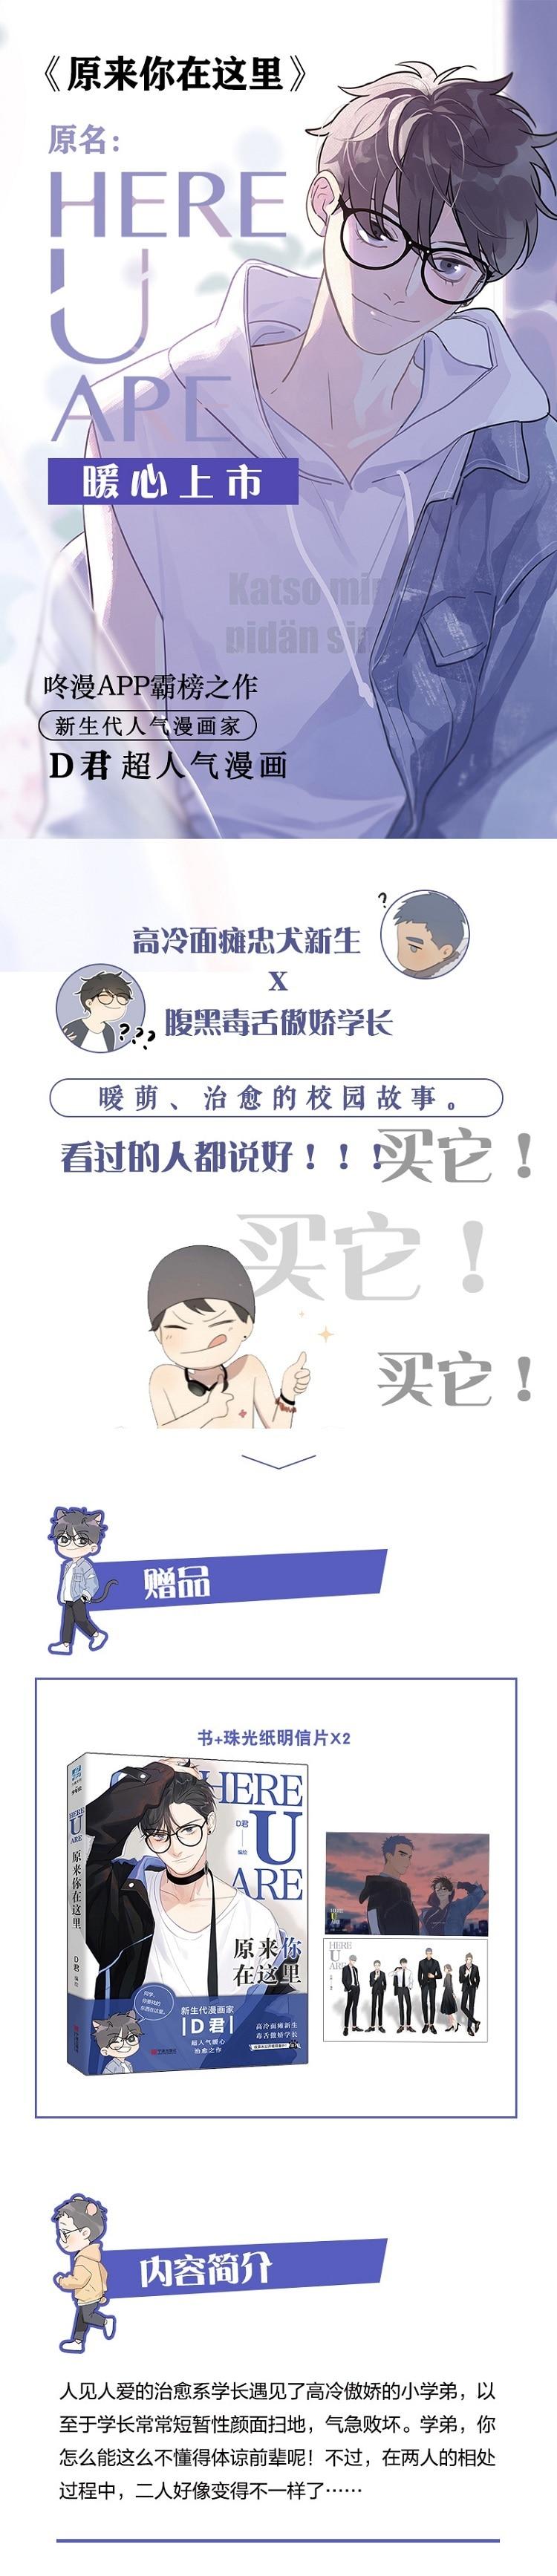 New Here U Are Manga Comic Fiction Book D Jun Works Bl Comic Novel Campus Love Boys Youth Comic Fiction Books Manhwa Hot Price D333e6 Cicig